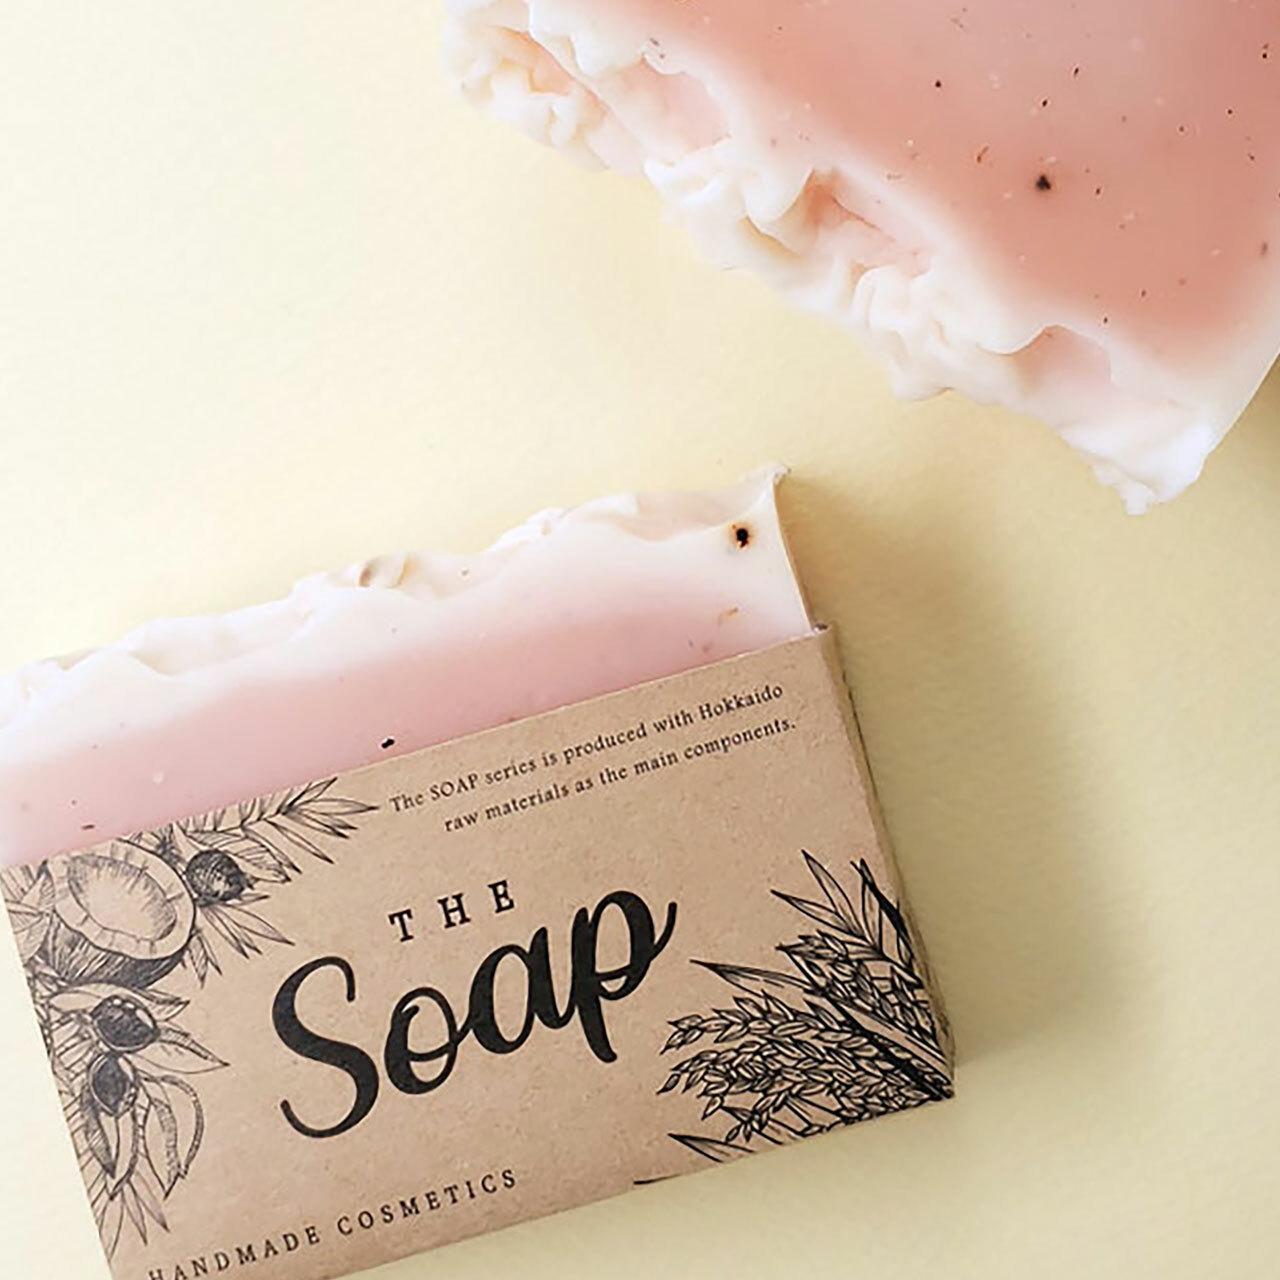 THE Soap(ヒース)